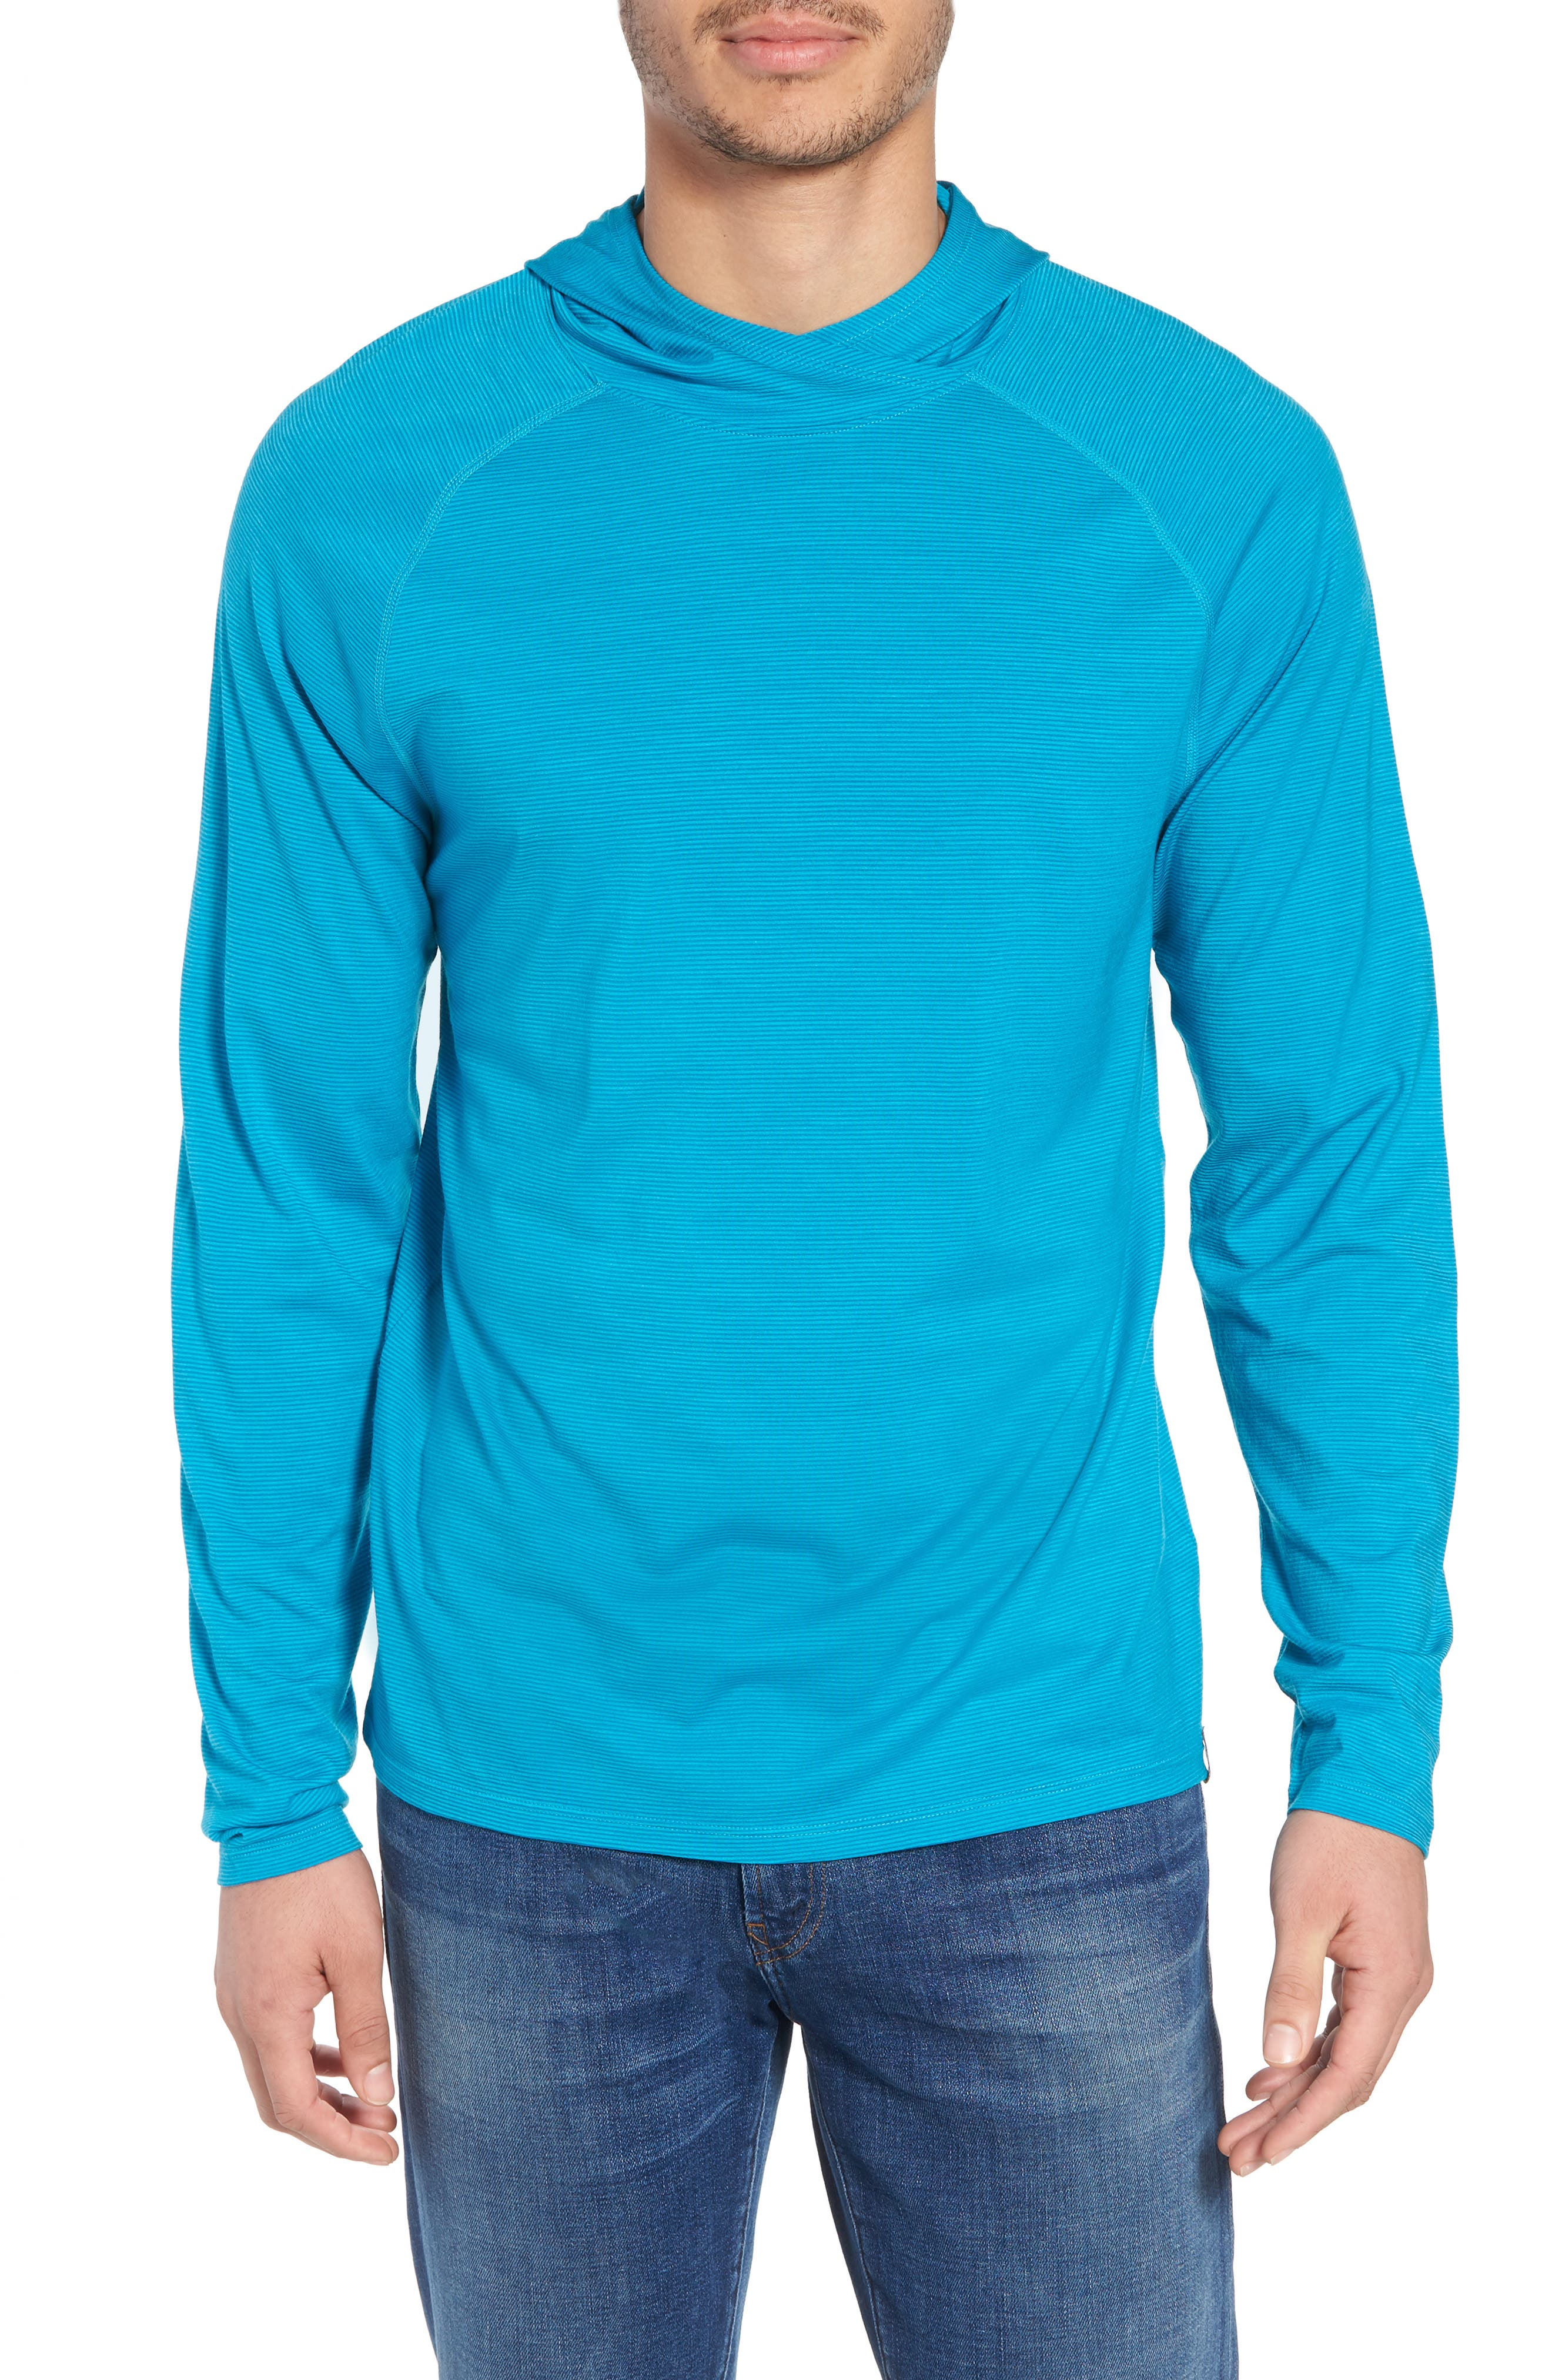 Merino 150 Wool Blend Hoodie,                             Main thumbnail 1, color,                             Sea Blue